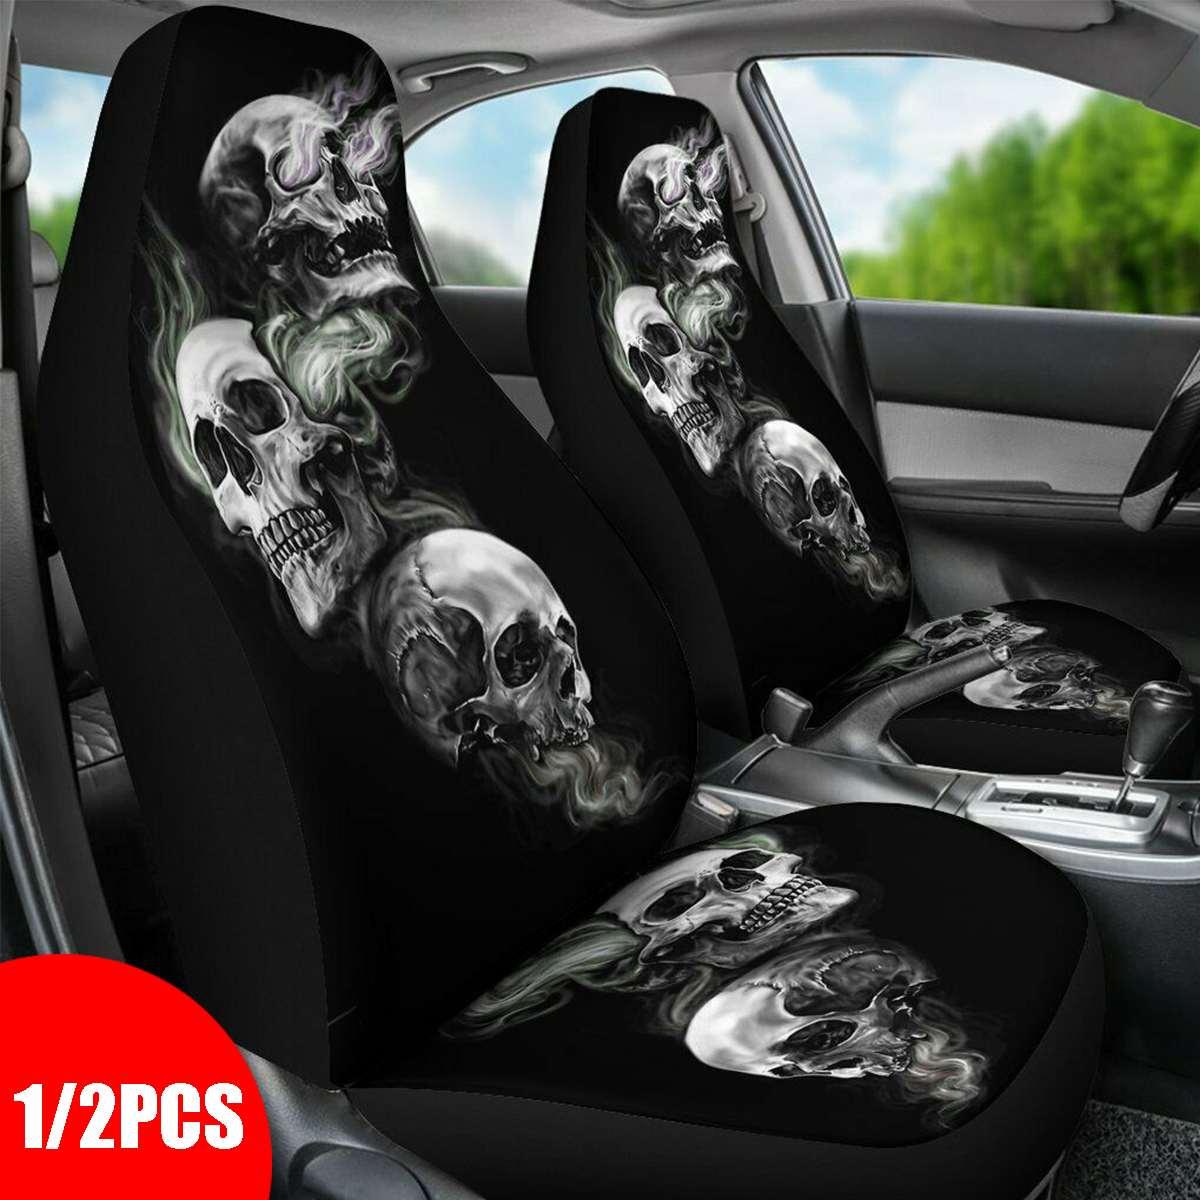 1 Pack CAFFER Car Seat Back Protectors